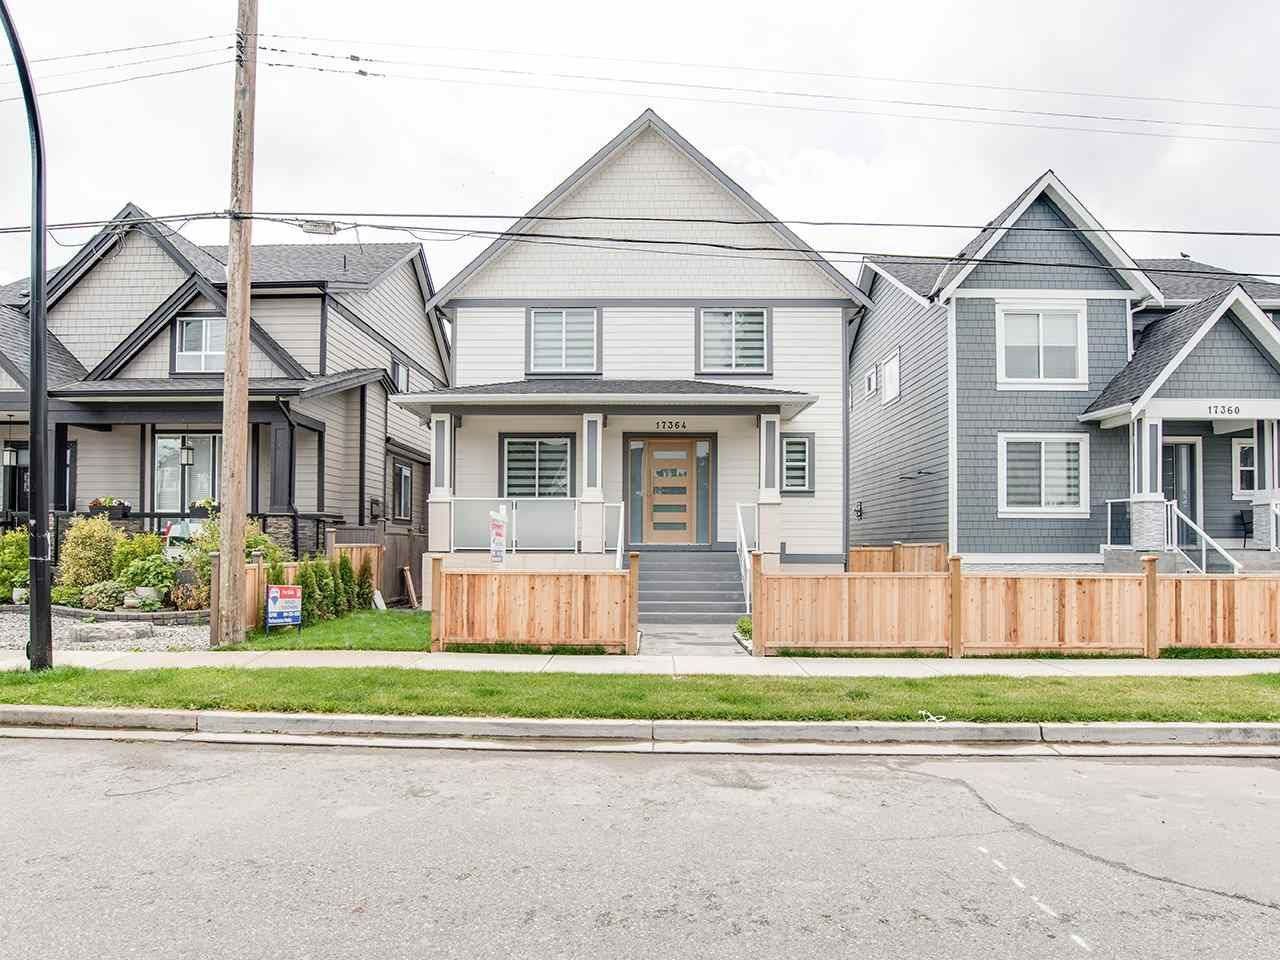 Main Photo: 17364 2 Avenue in Surrey: Pacific Douglas House for sale (South Surrey White Rock)  : MLS®# R2471049